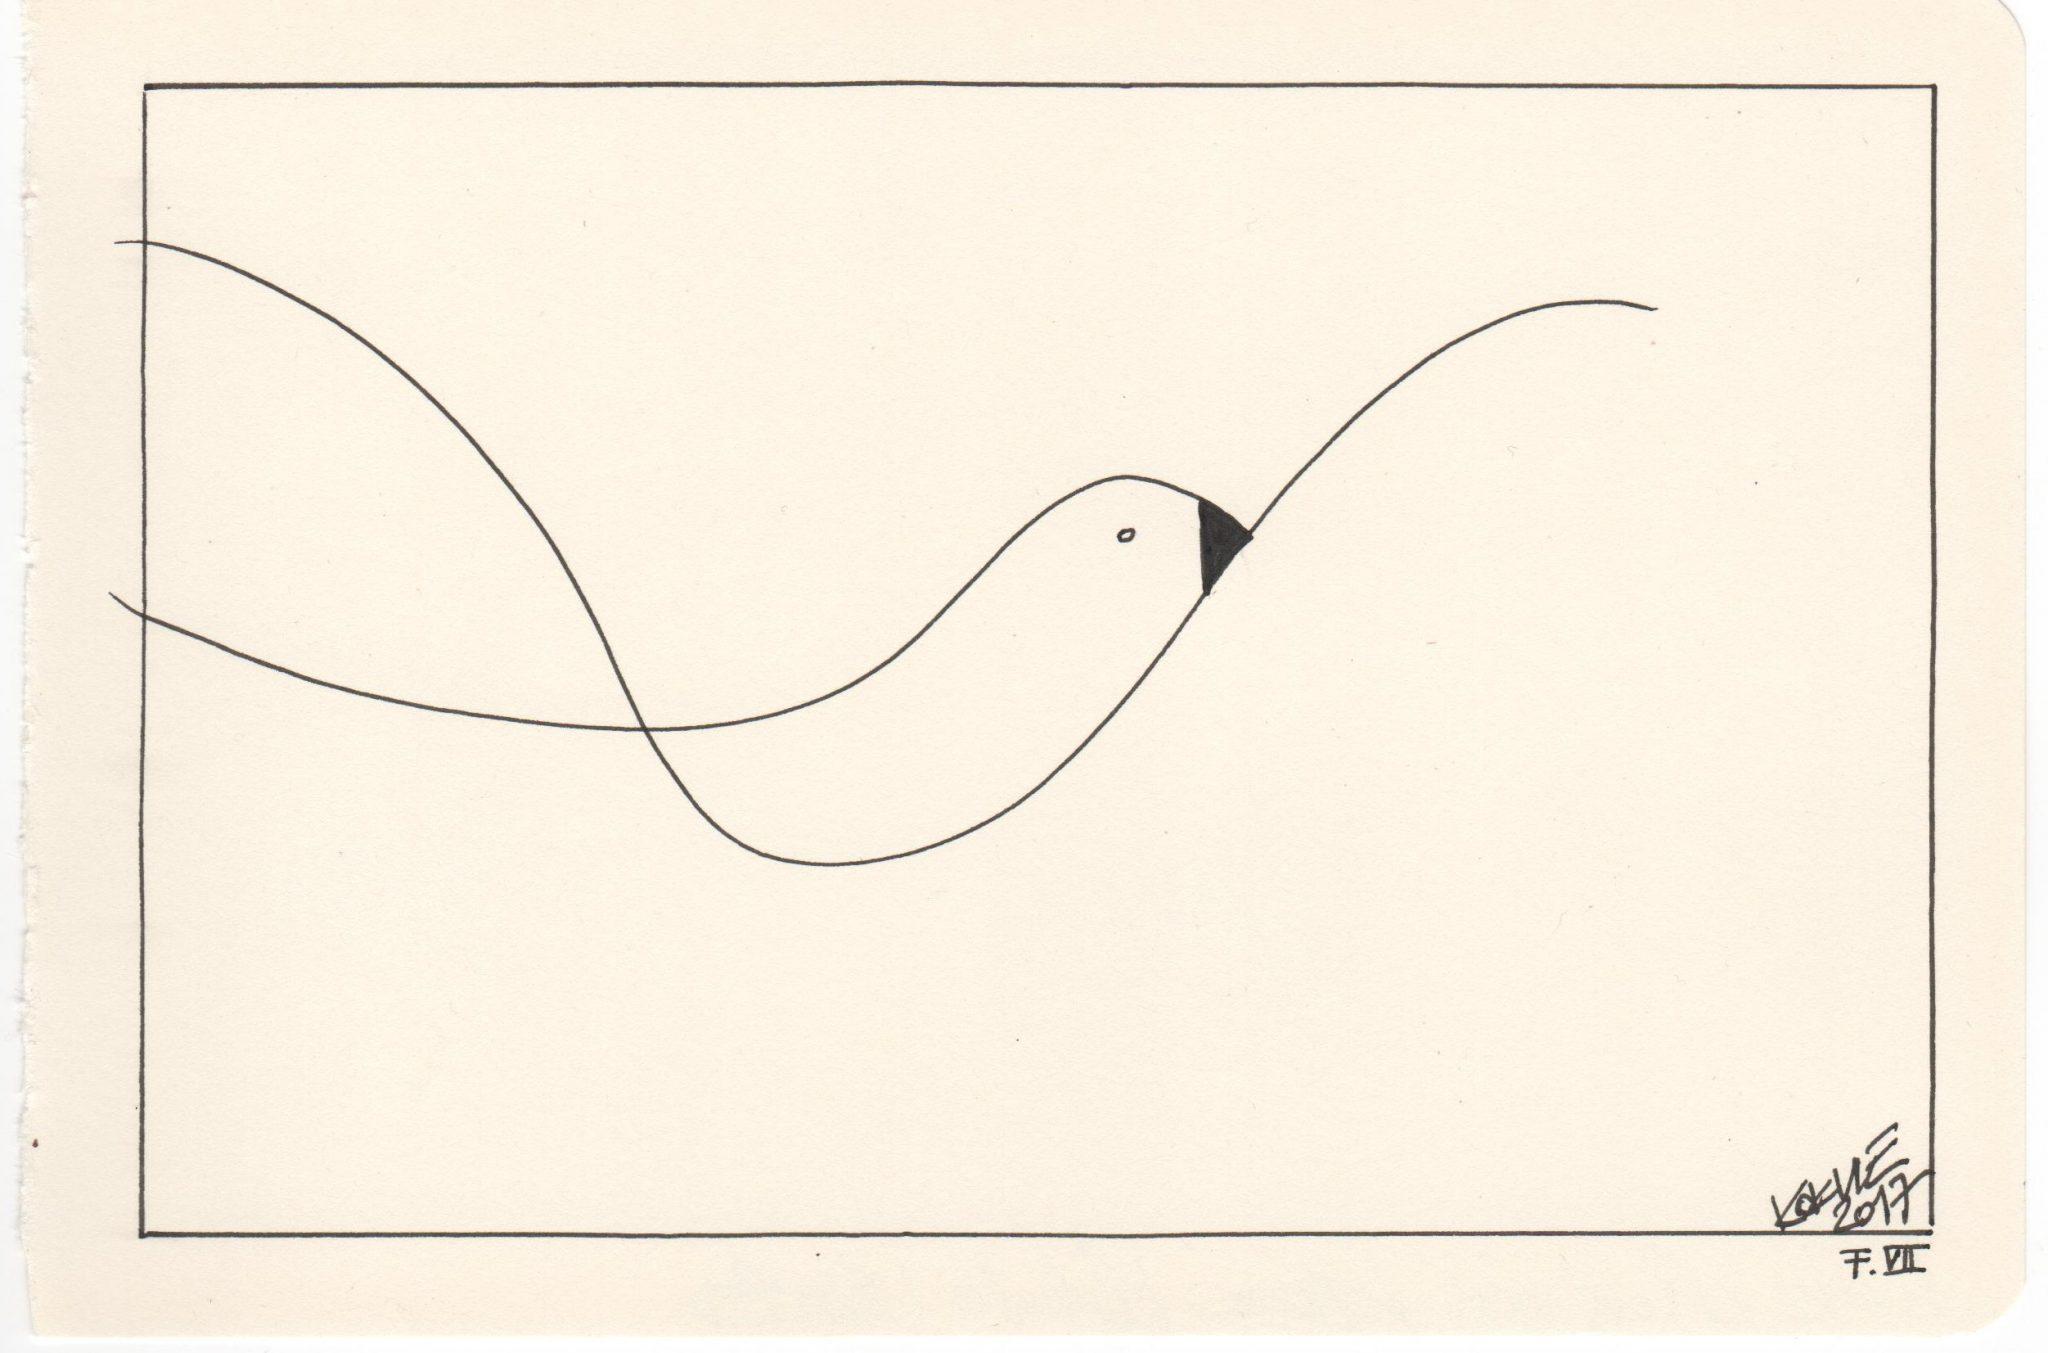 Kim Okura Flieg 7 Seagull ink drawing ATV 207